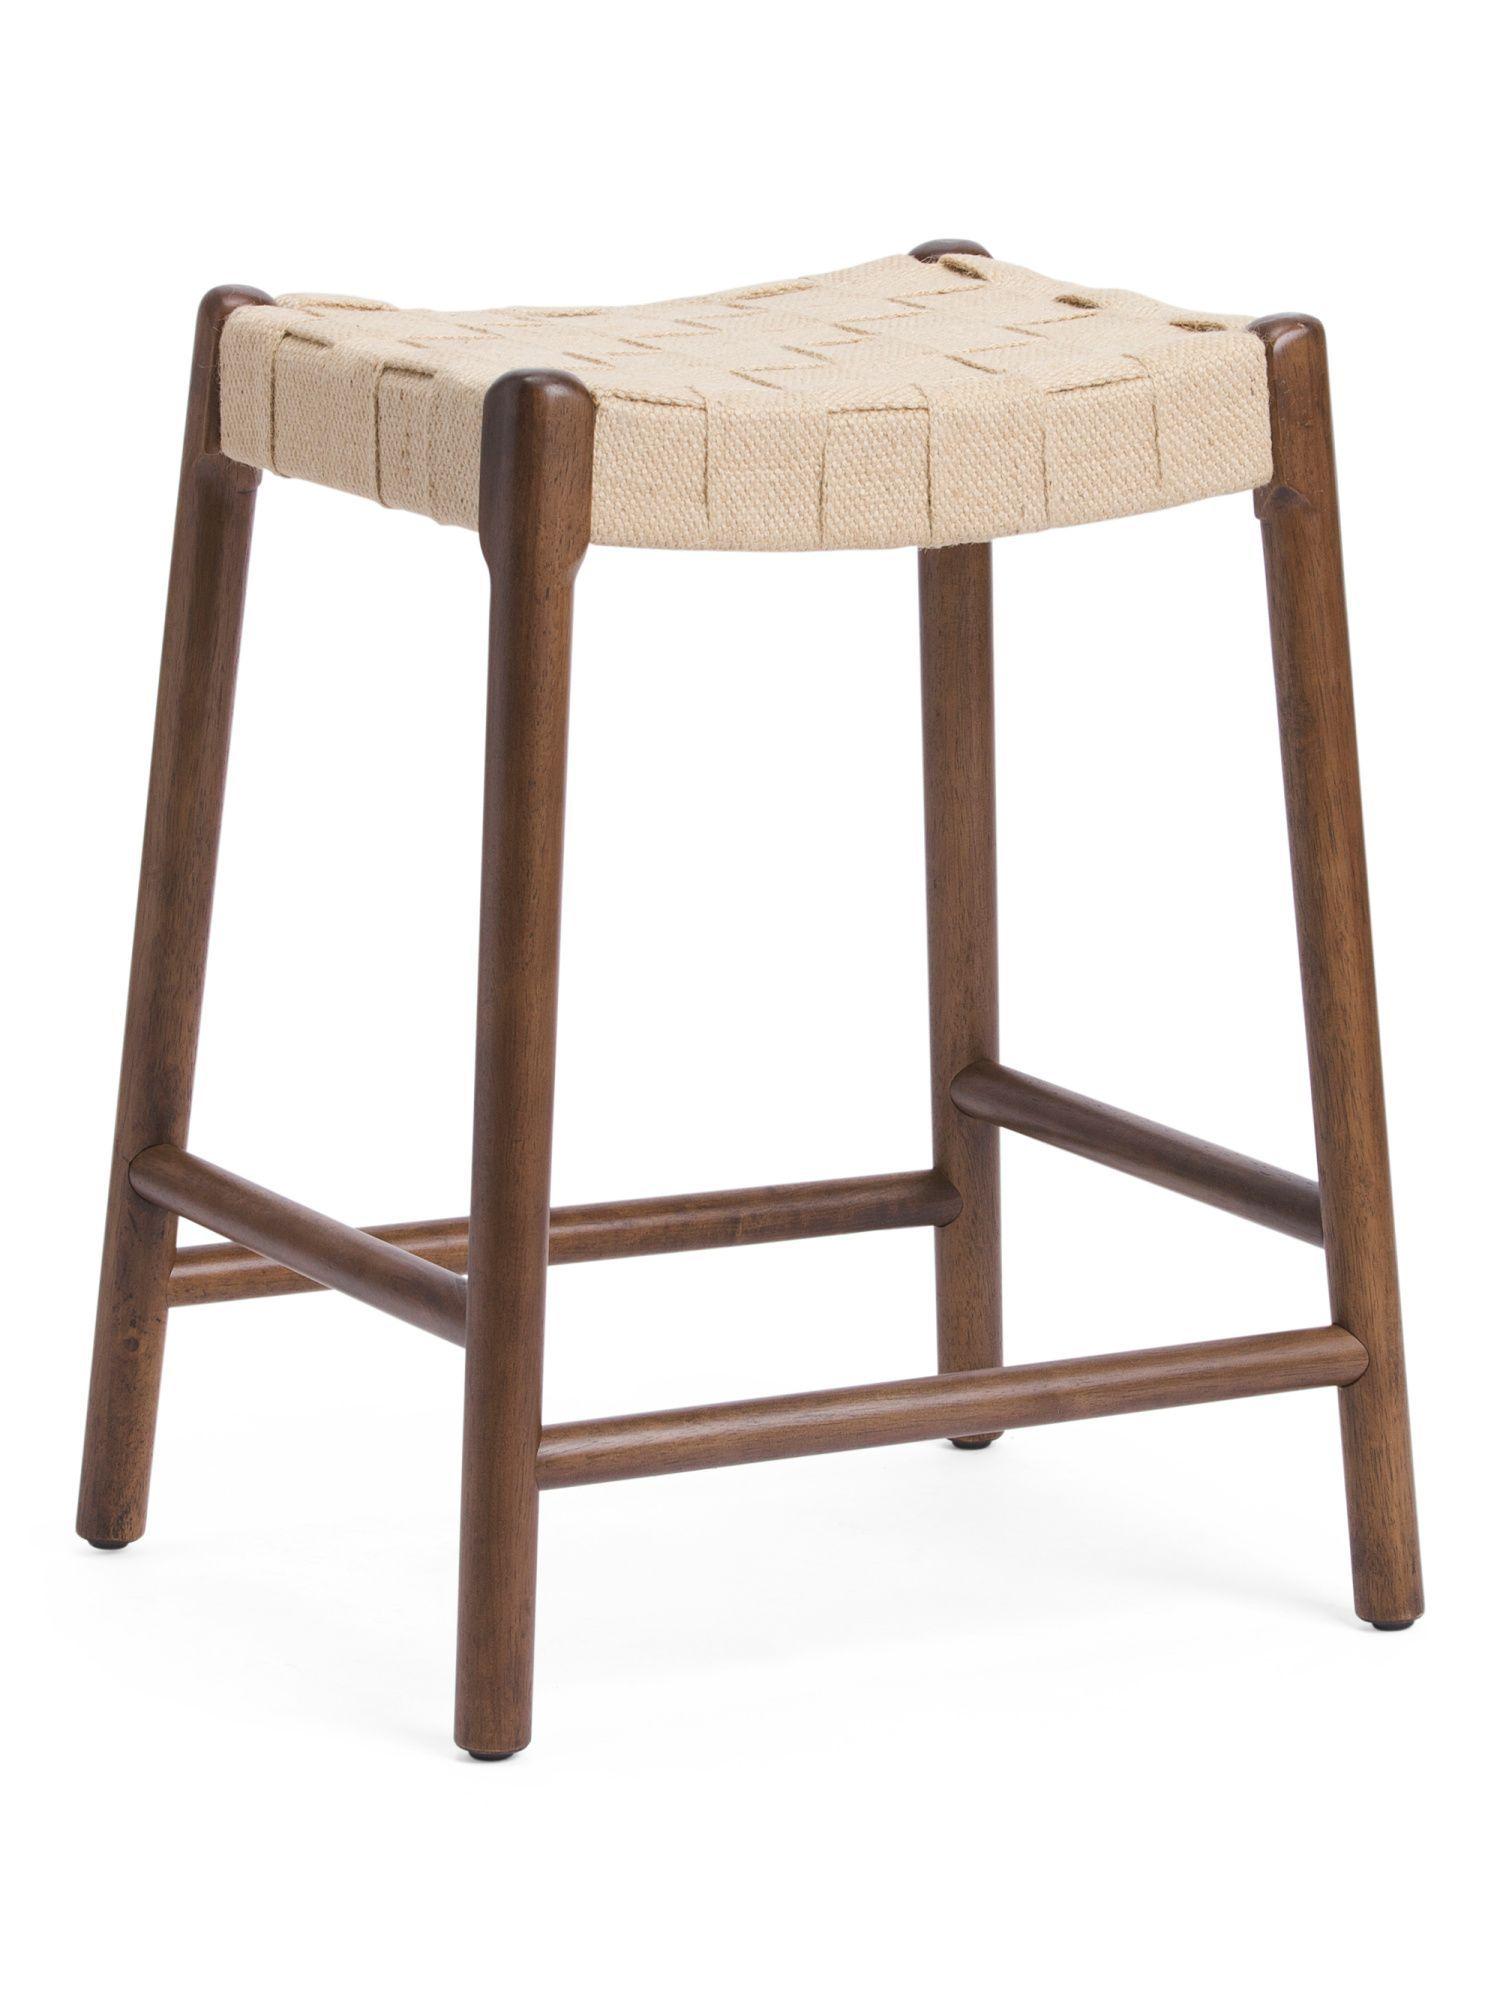 Pleasing High Resolution Image Interiors Stool Vanity Stool Inzonedesignstudio Interior Chair Design Inzonedesignstudiocom